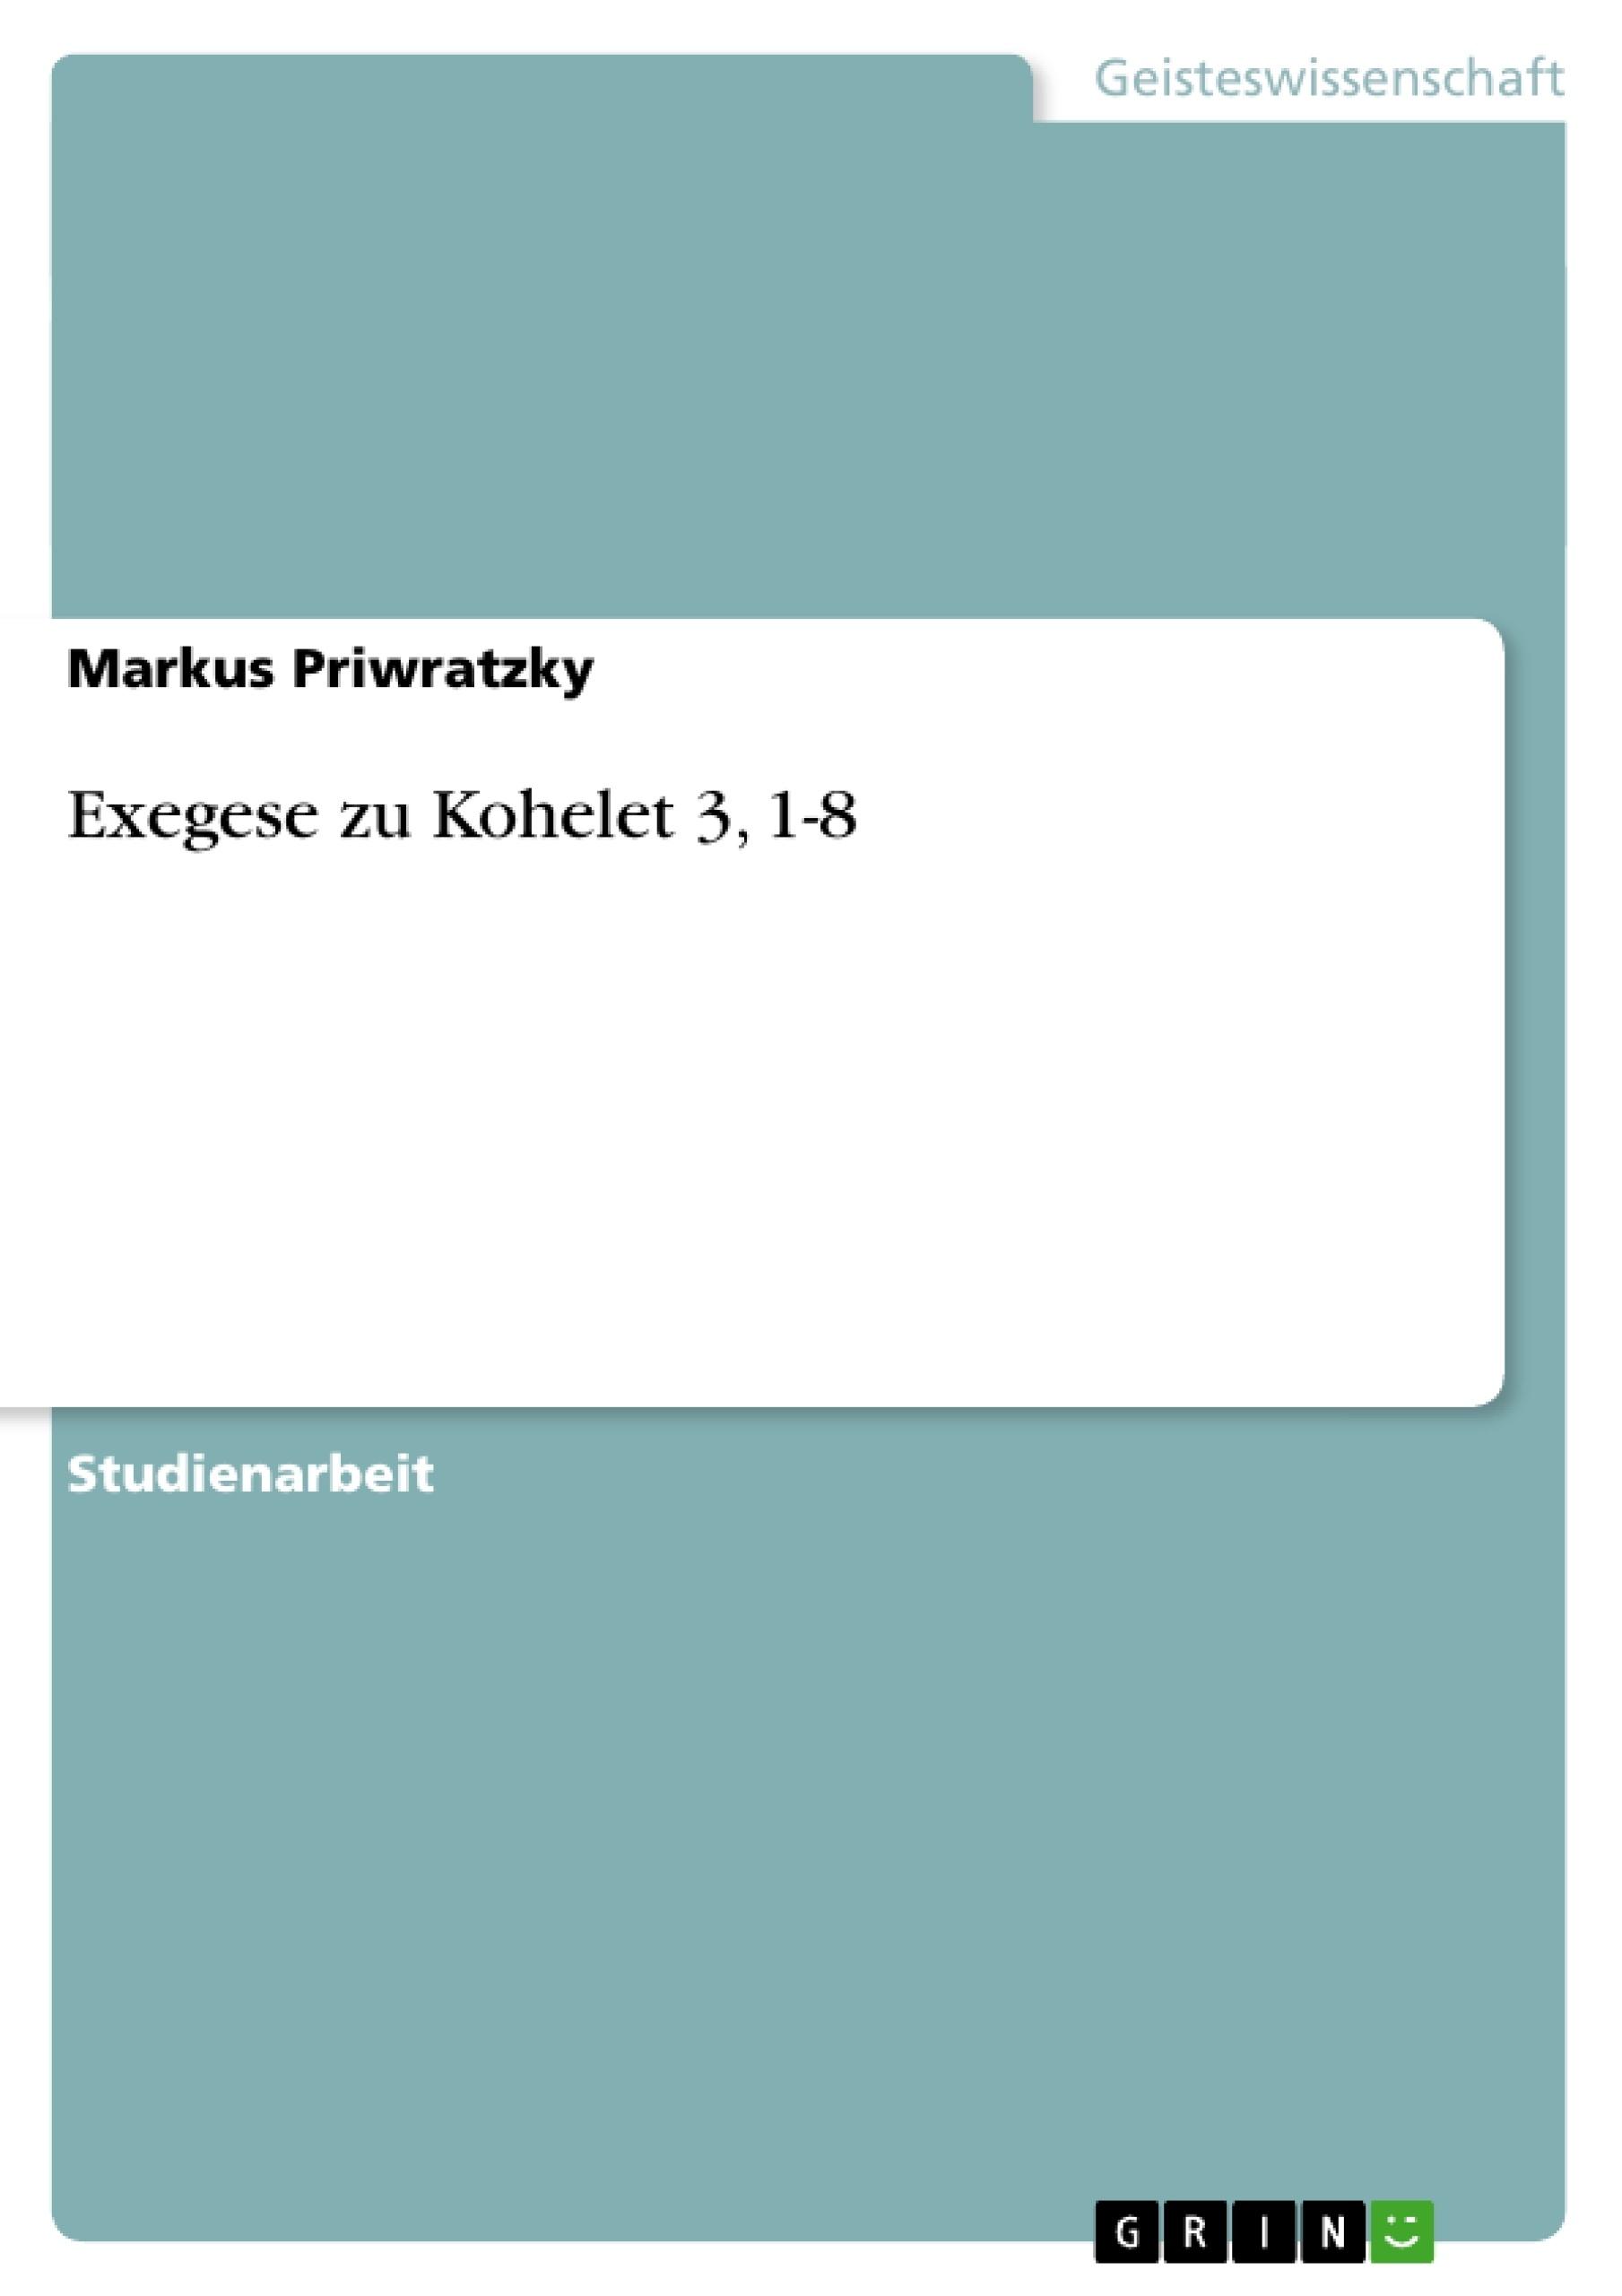 Titel: Exegese zu Kohelet 3, 1-8